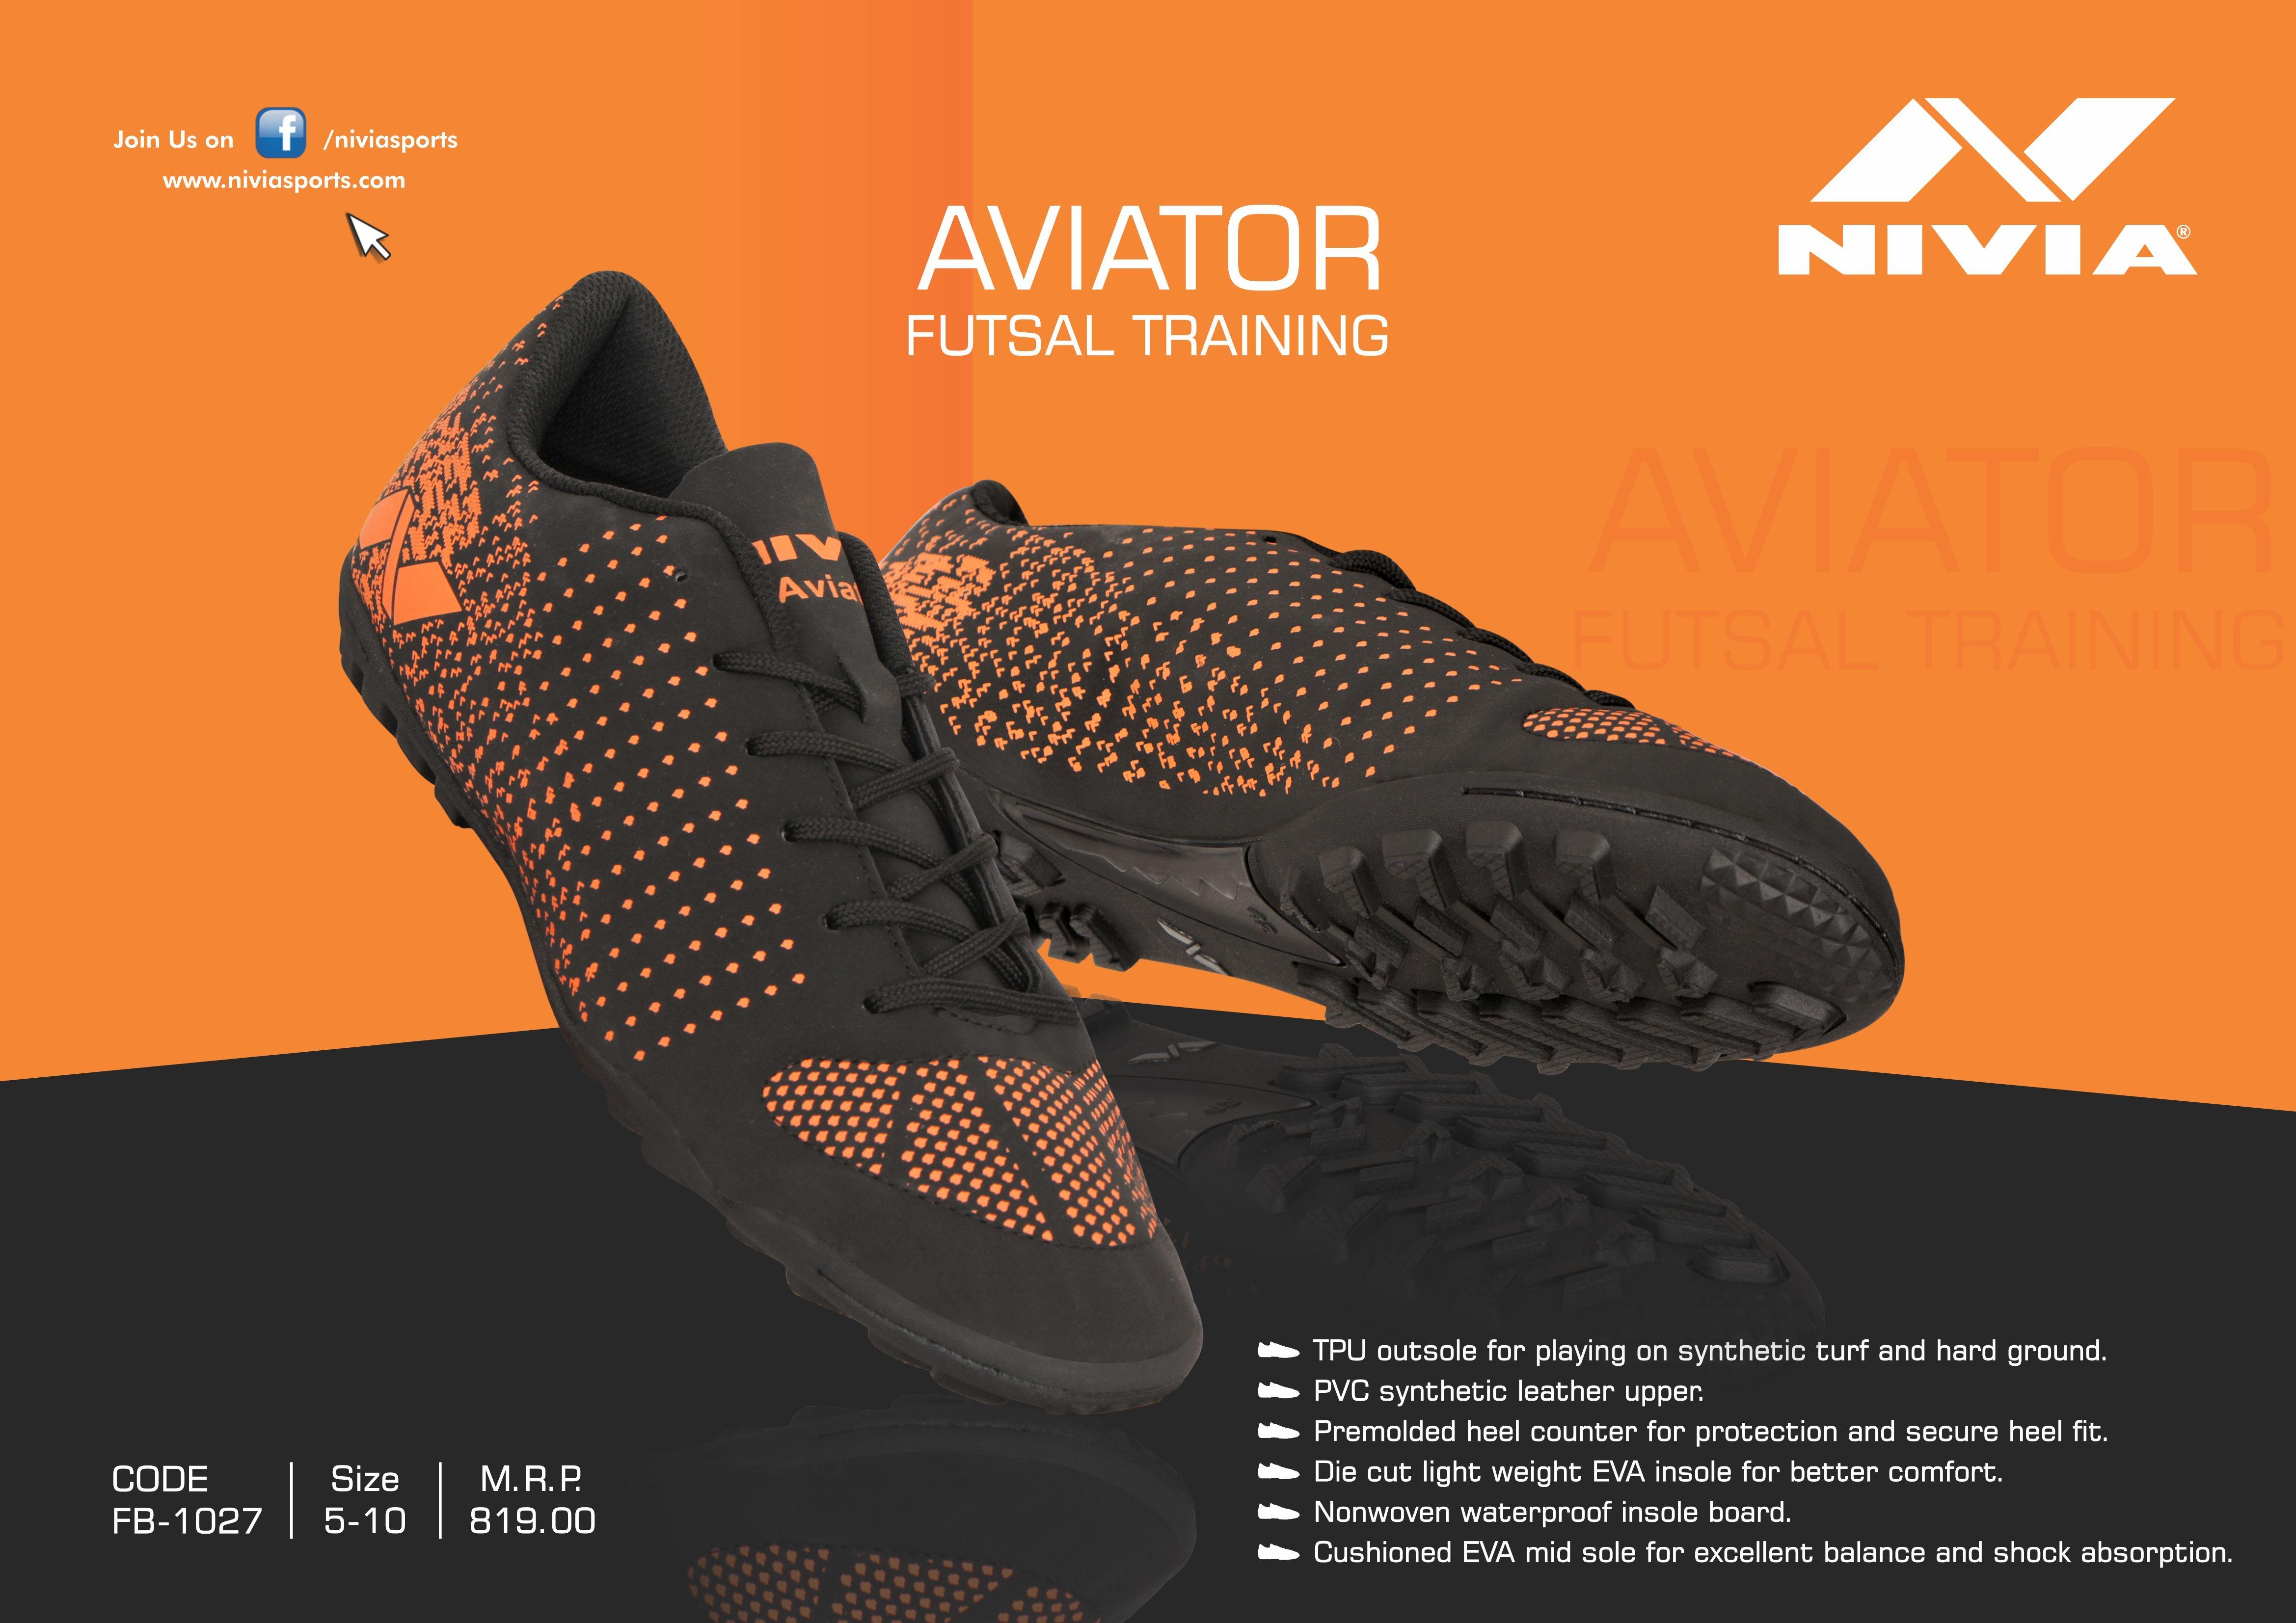 f075bff3c59 NIVIA Aviator Futsal Shoe